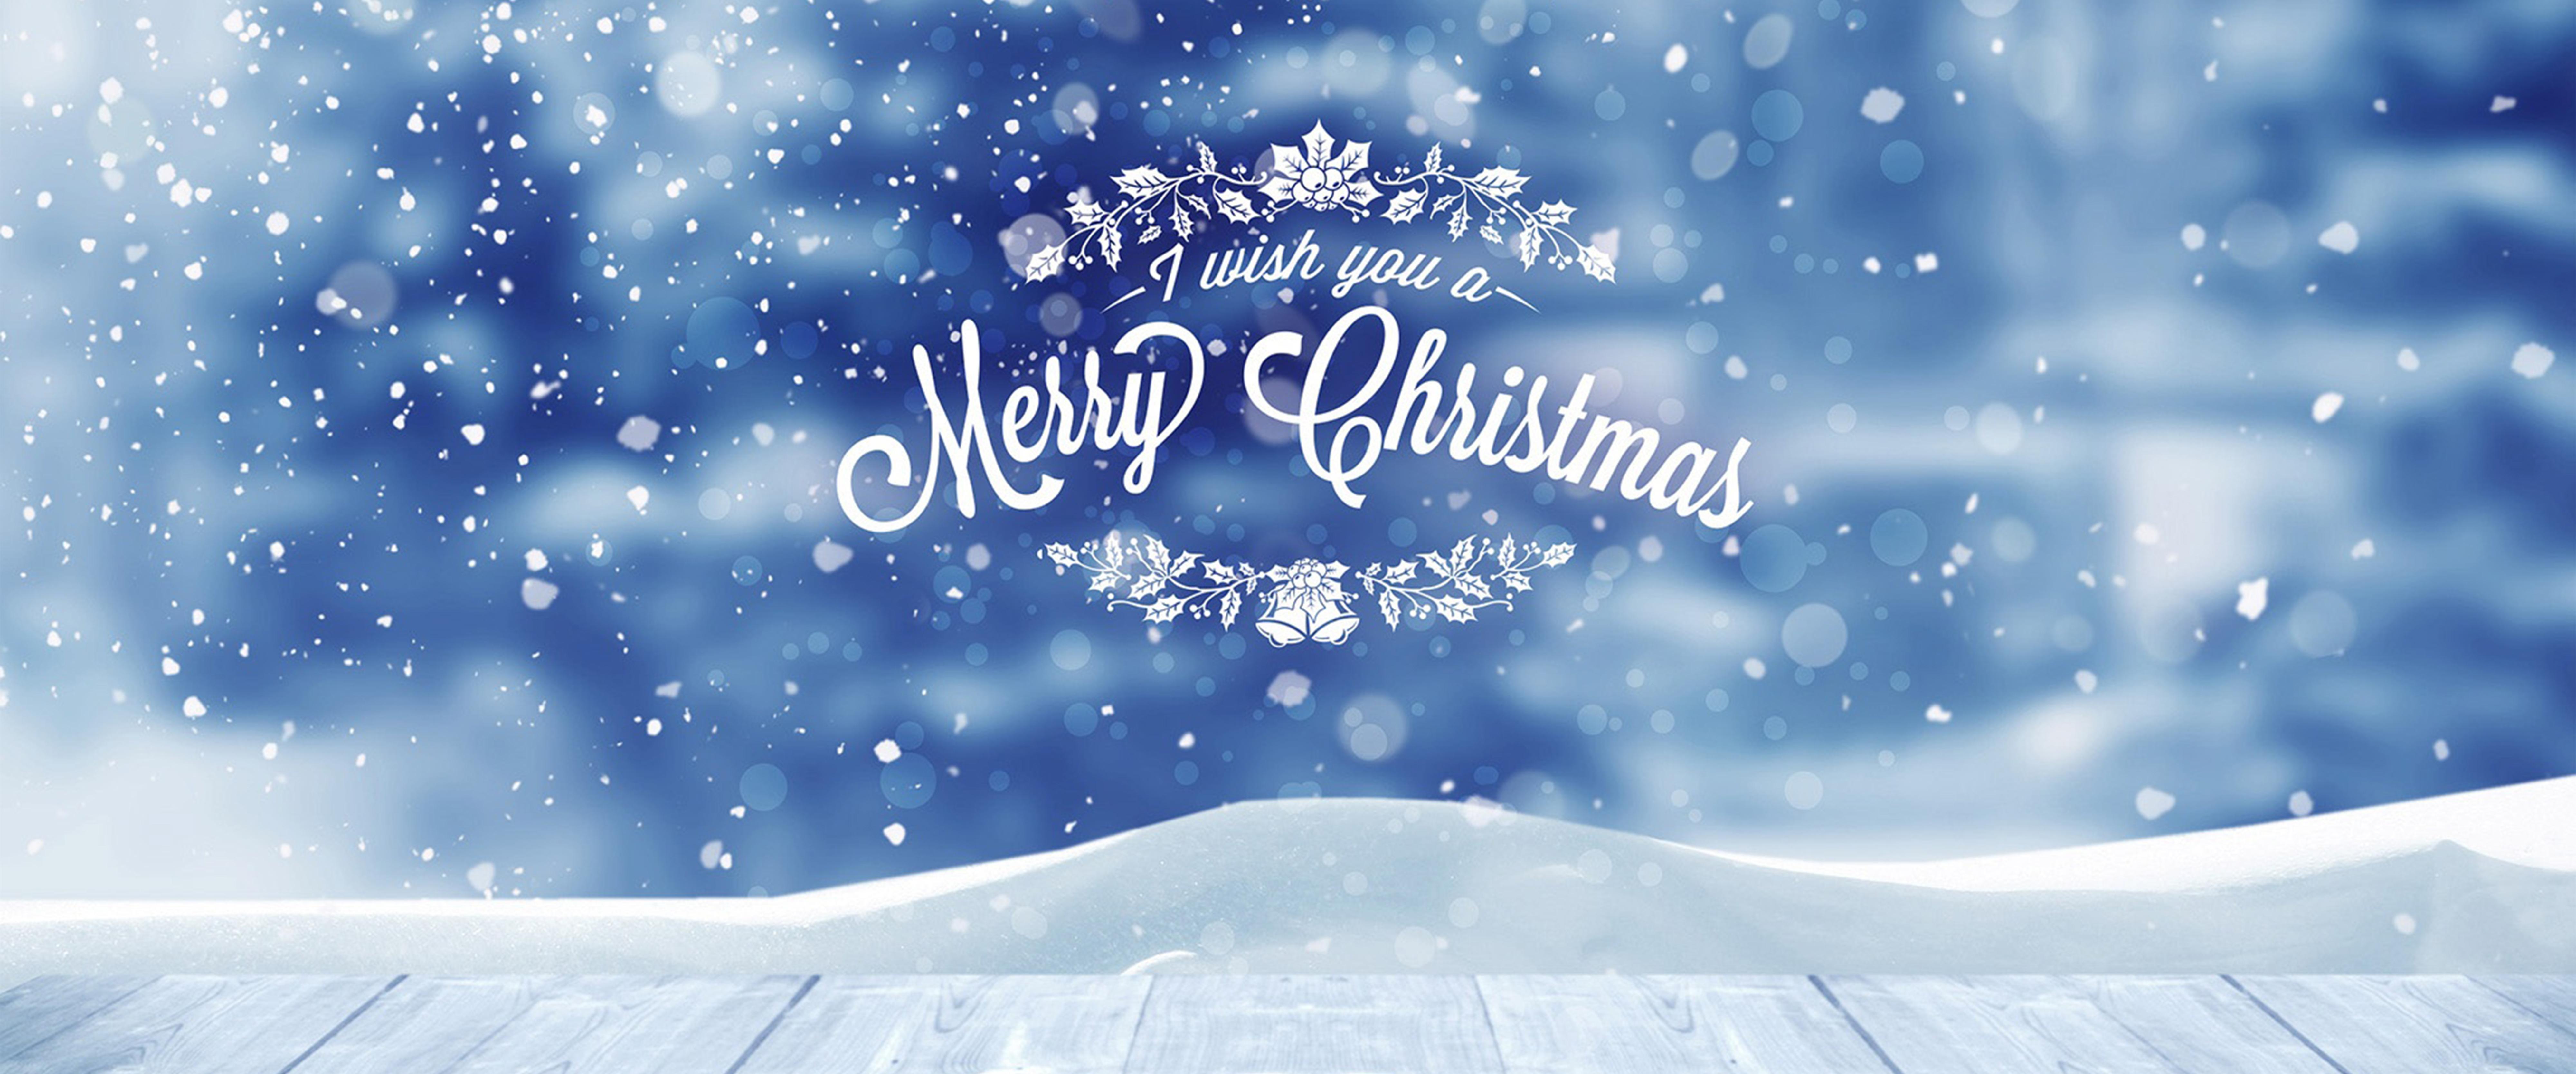 Christmas Snow Background Poster, Blue, Snow, Christmas ...